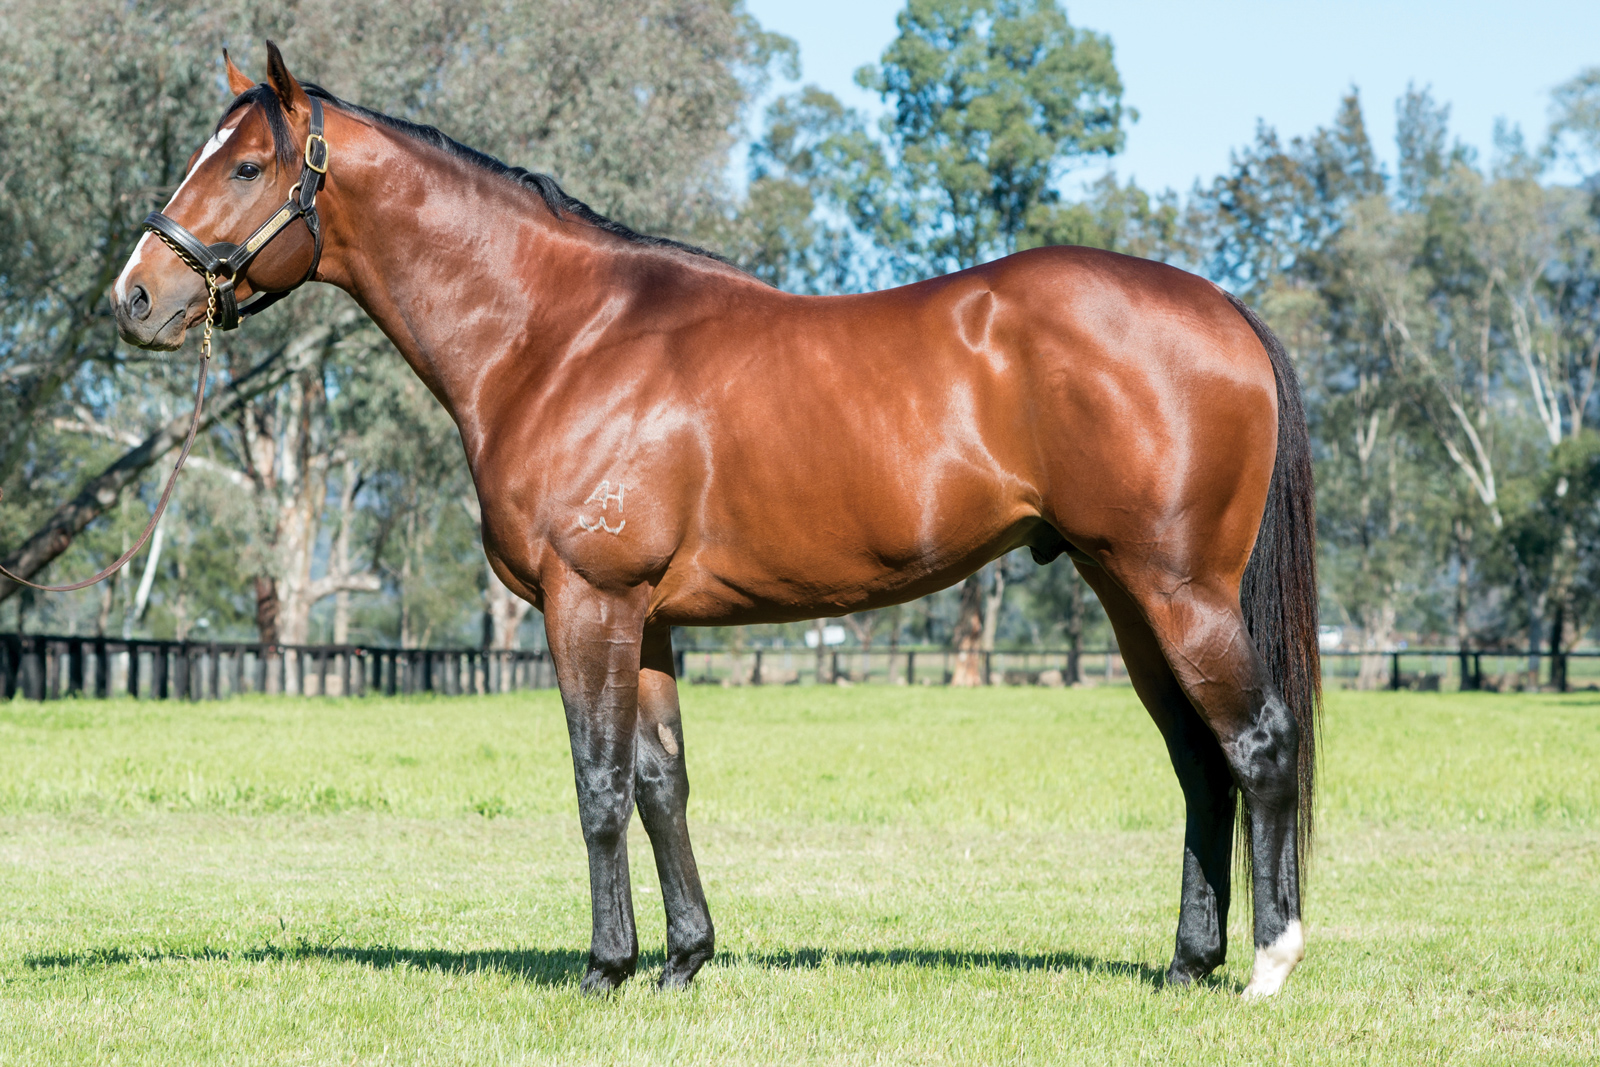 https://www.stallions.com.au/wp-content/uploads/2019/09/Outreach_2017-web.jpg